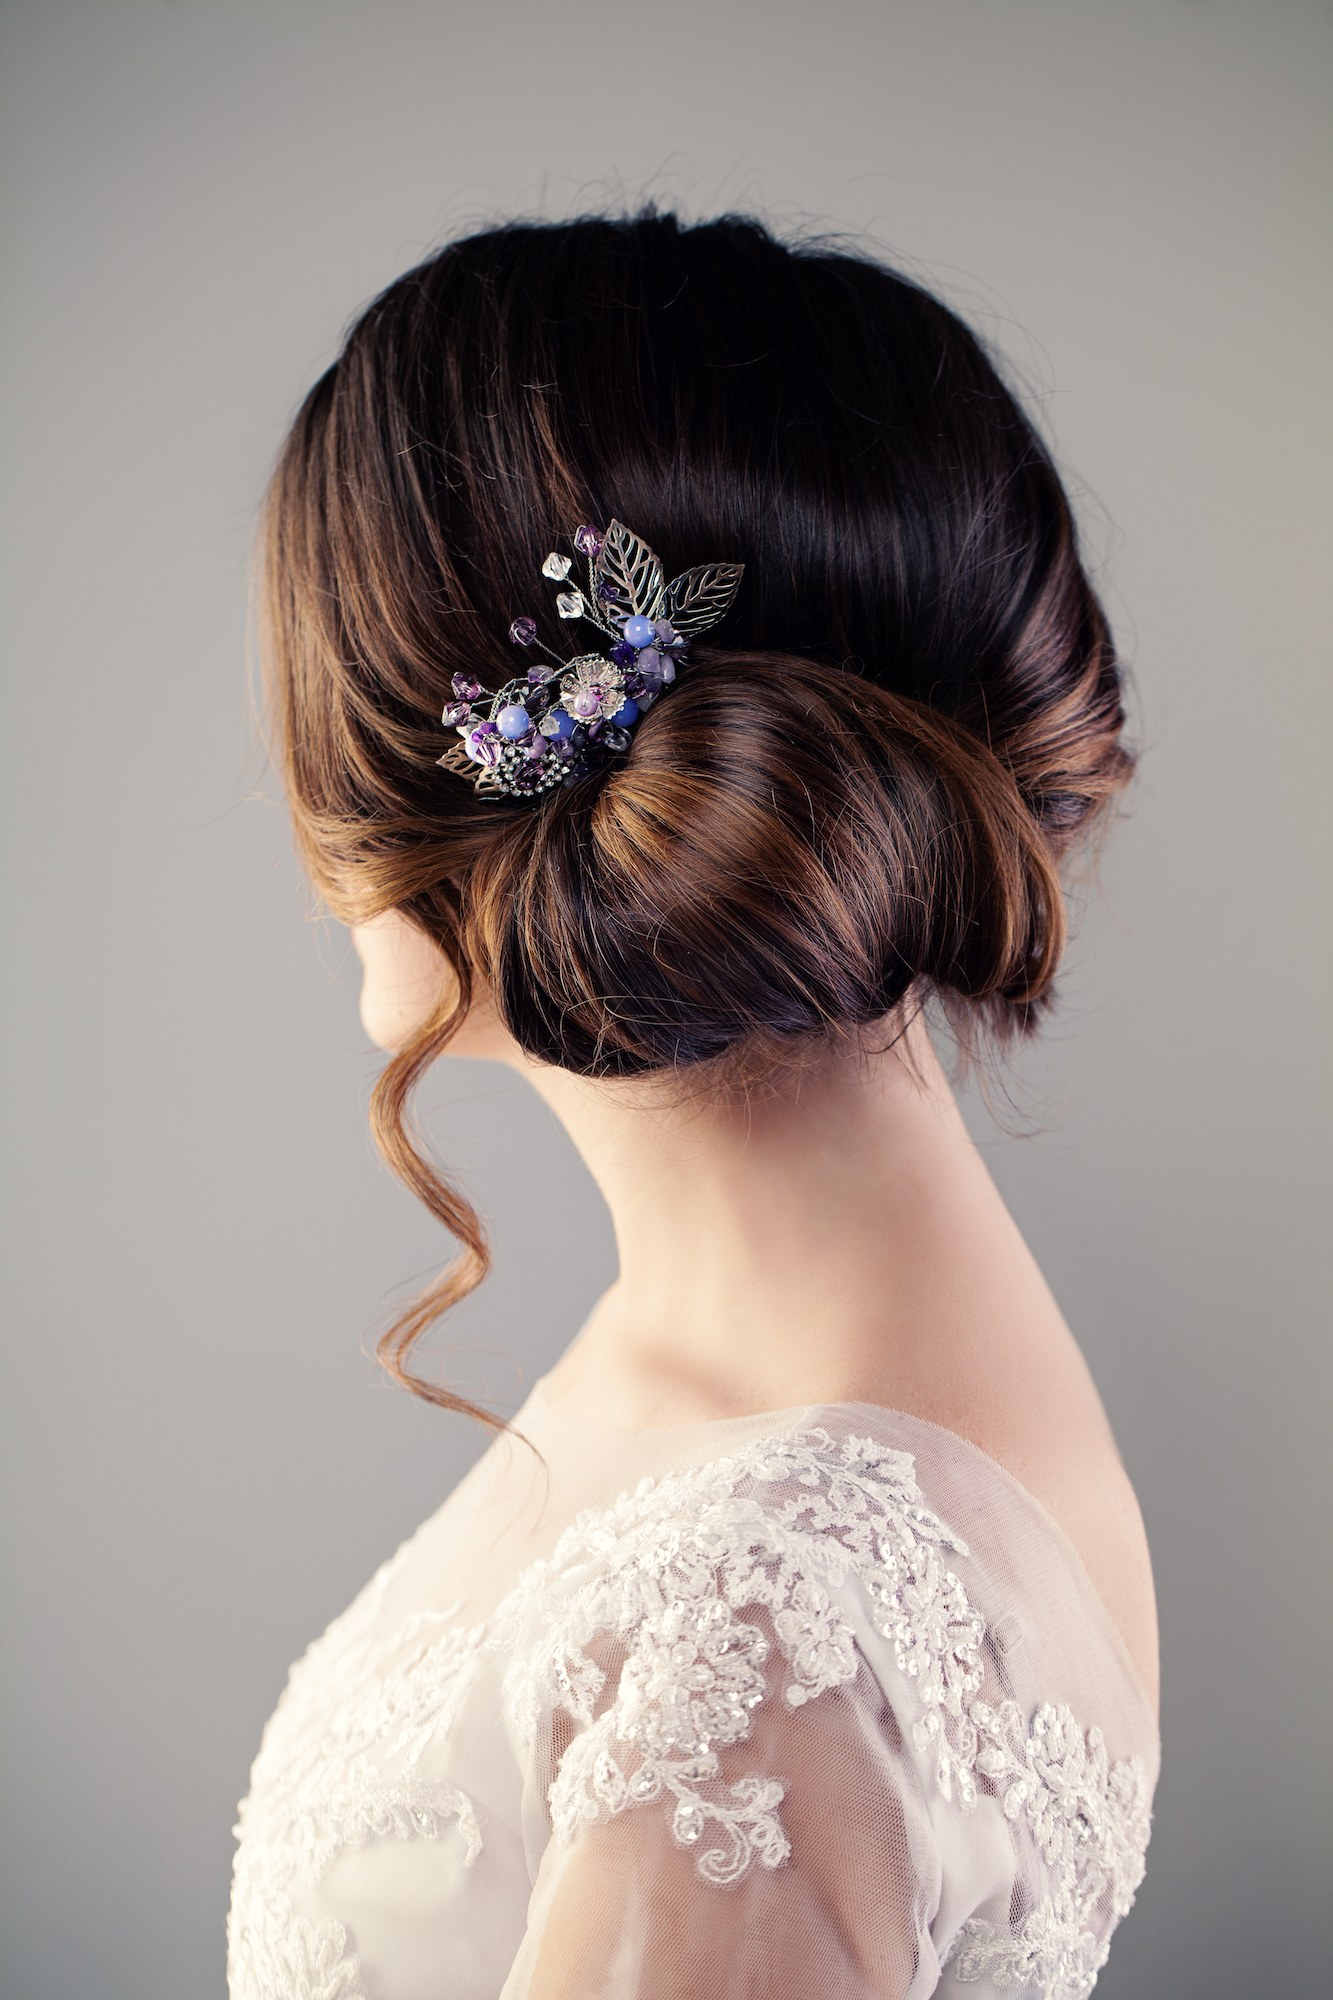 Gaya rambut pesta pernikahan side chignon.